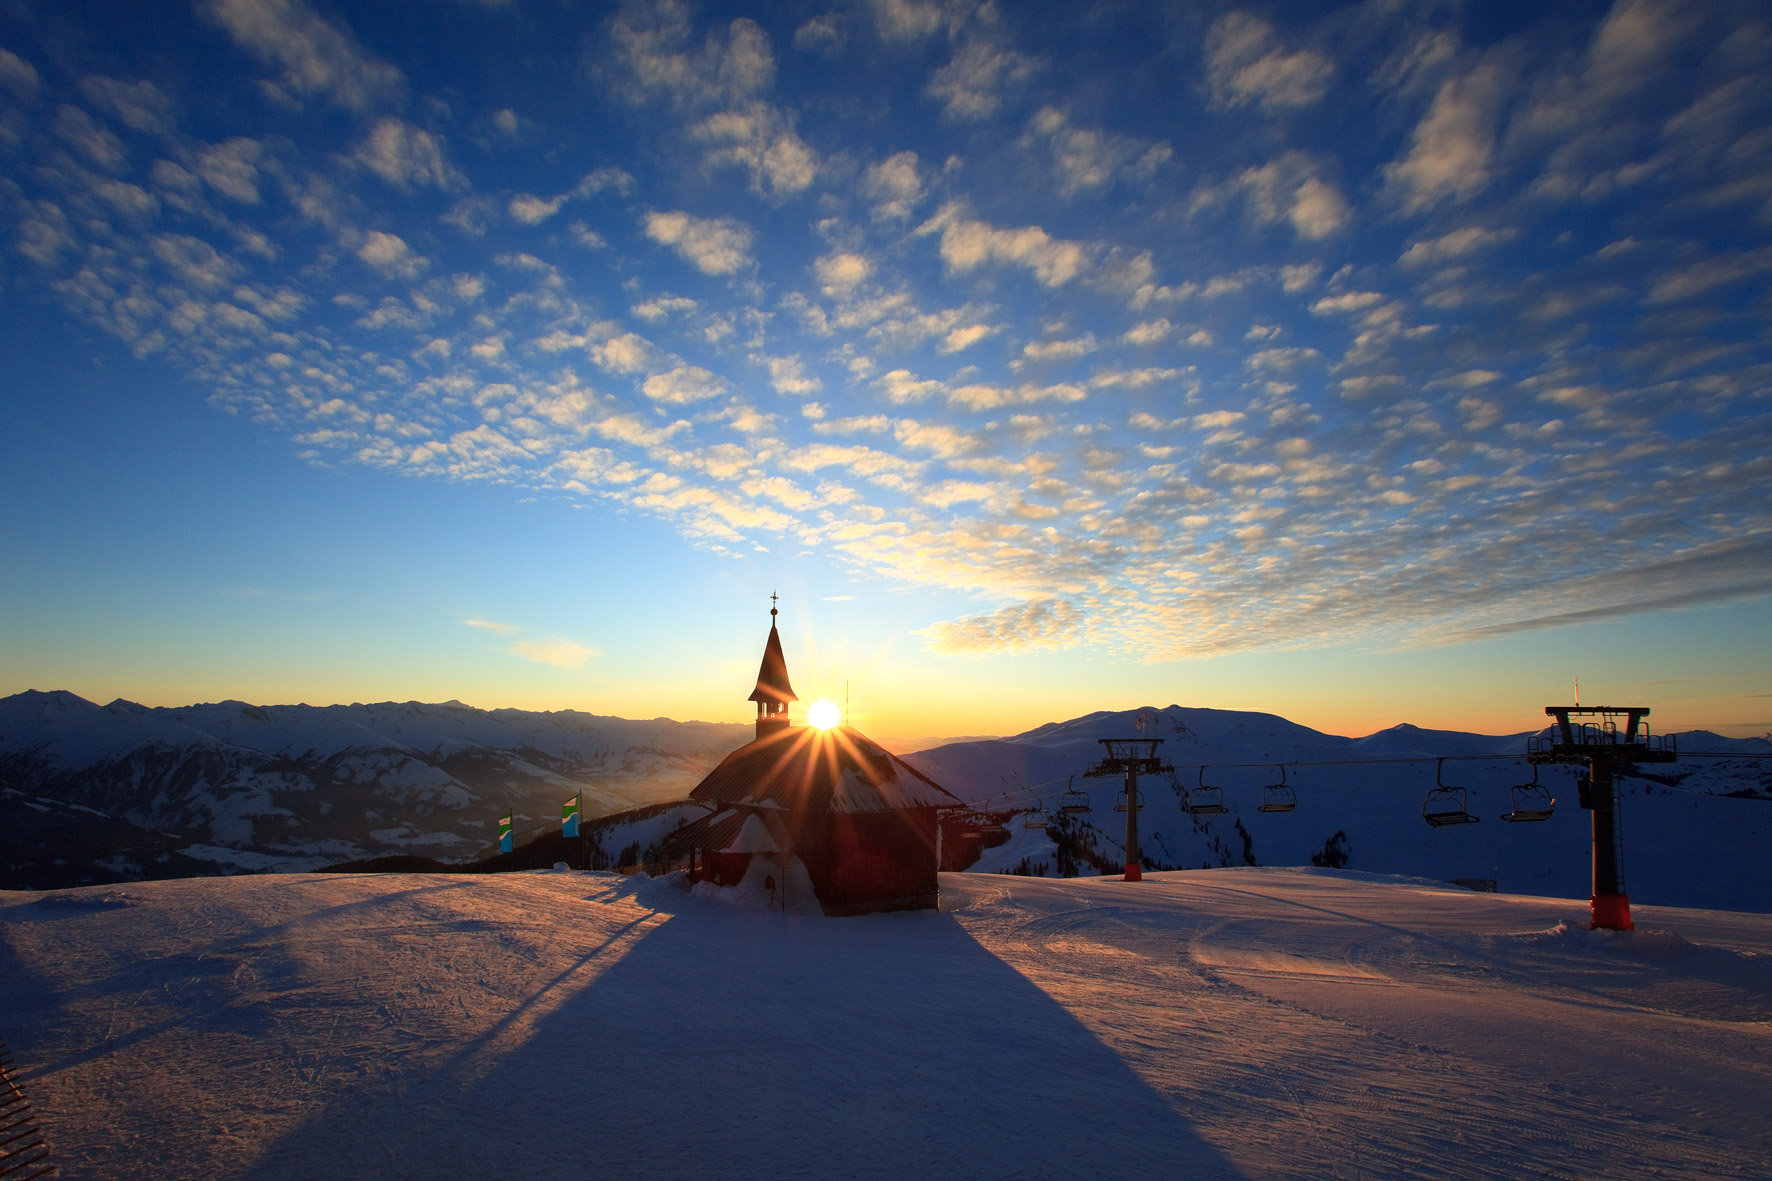 zell am see ski resort austria skiing born2ski holidays. Black Bedroom Furniture Sets. Home Design Ideas